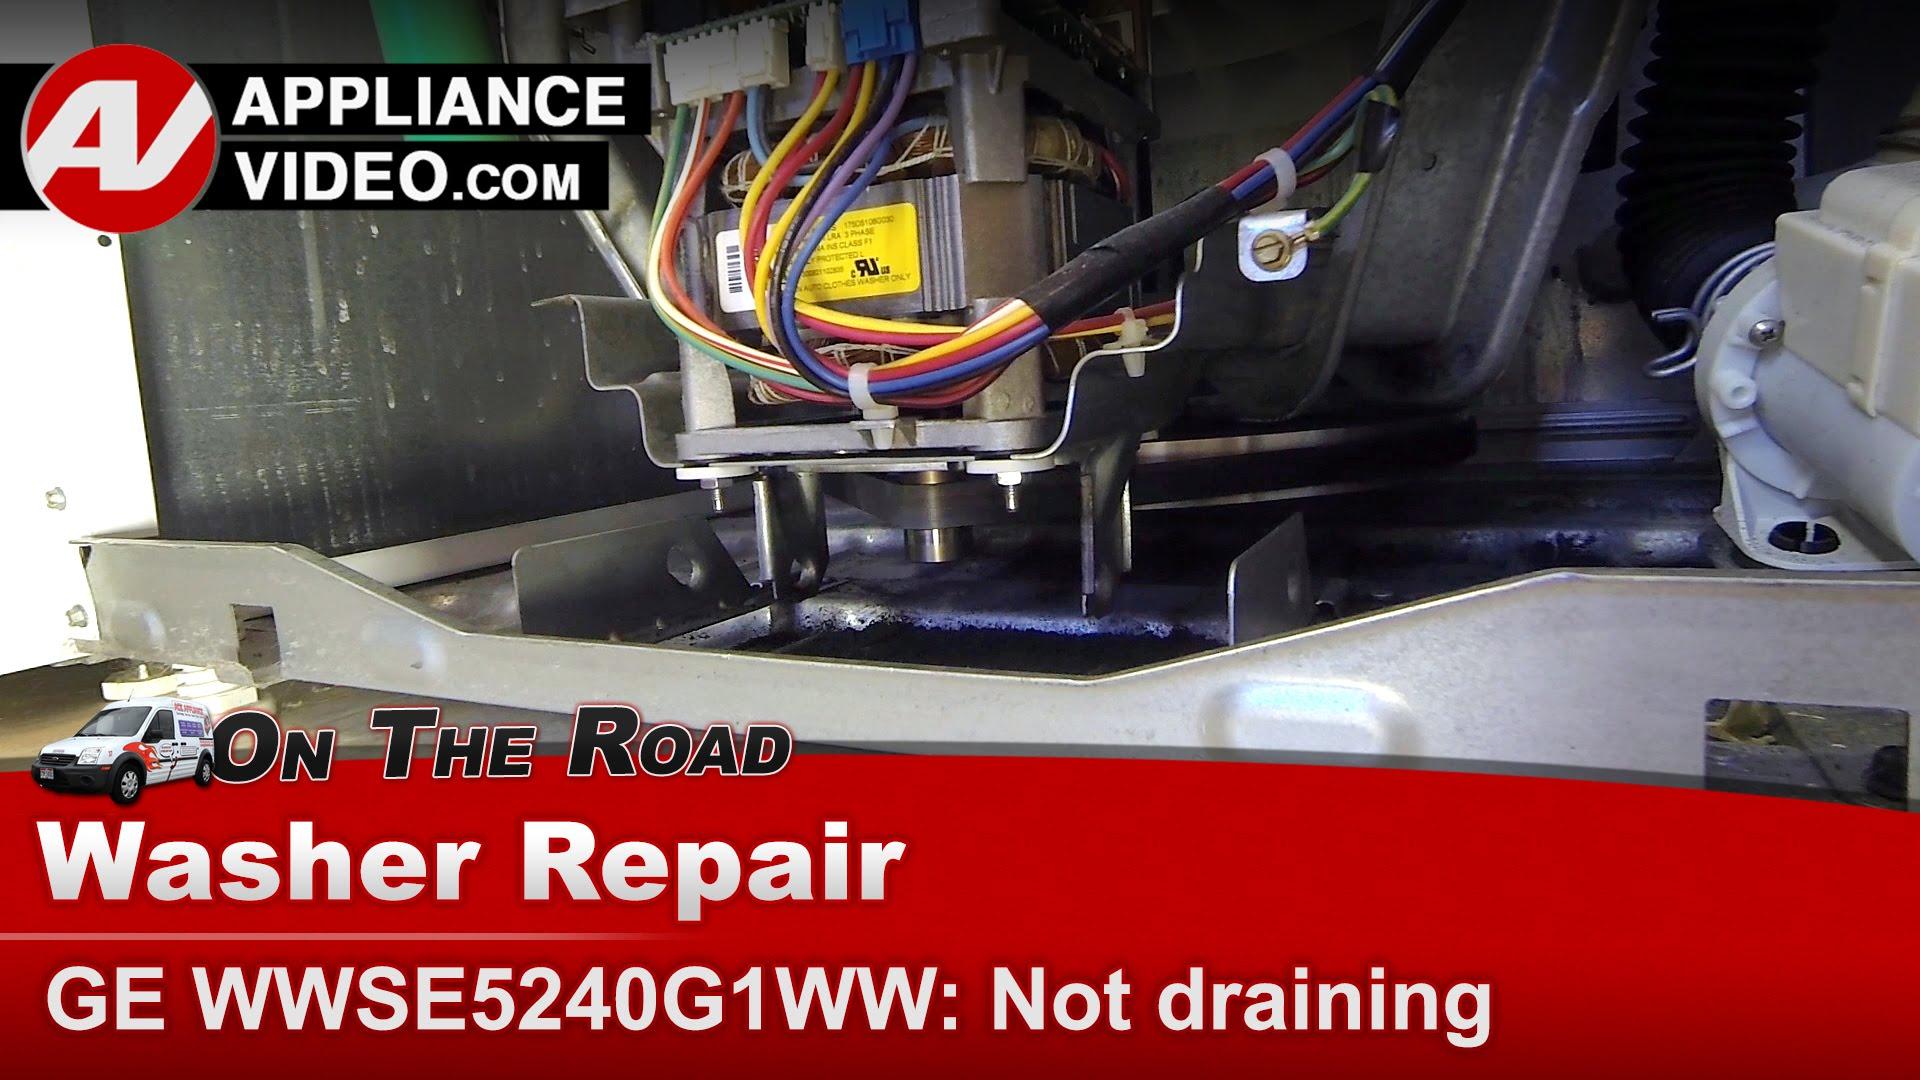 GE WWSE5240G1WW Washer – Not draining – Belt 6 Rib | Appliance Video